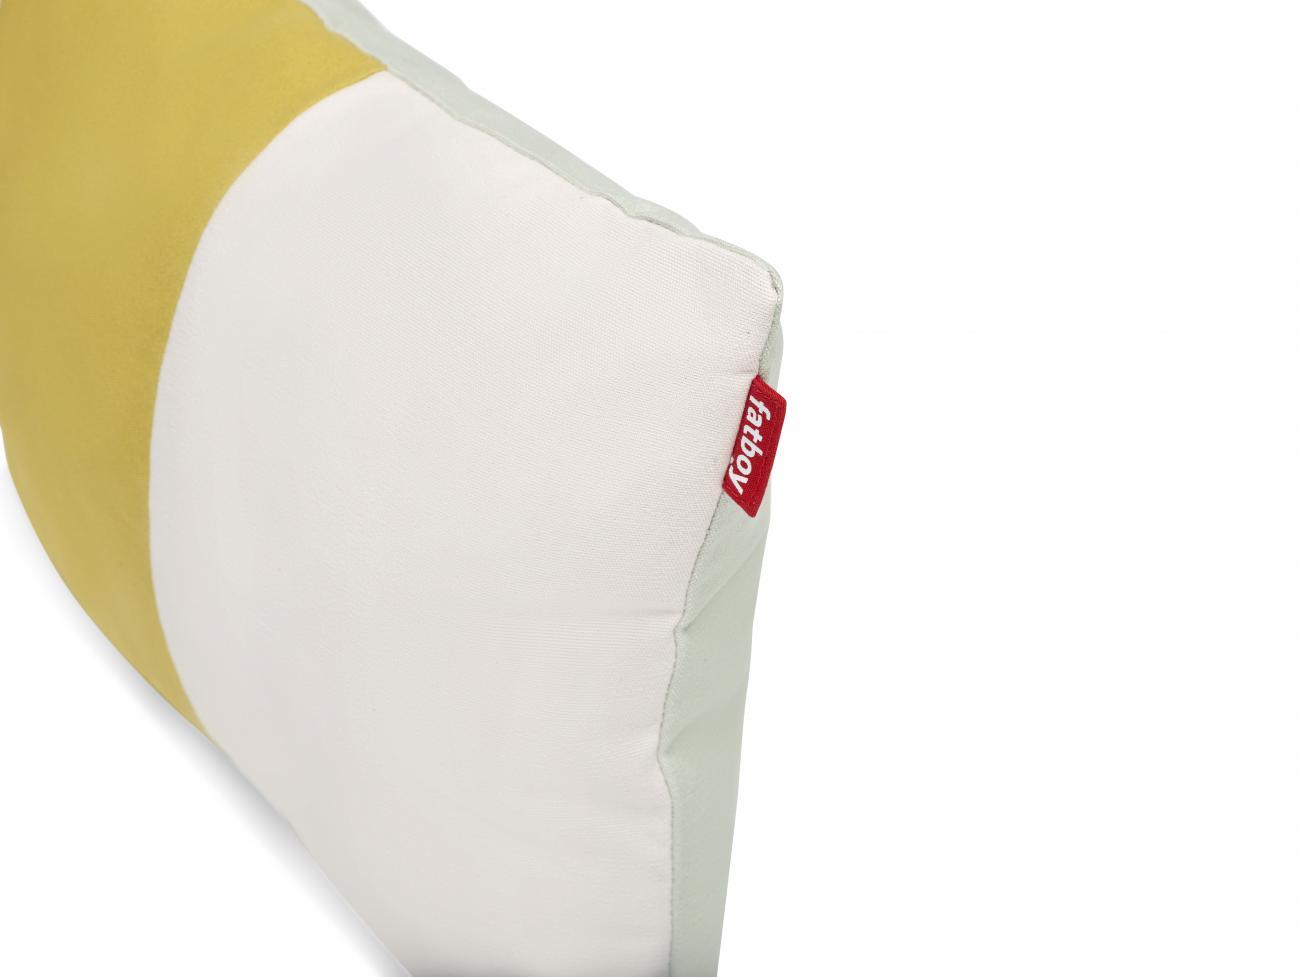 https://www.fundesign.nl/media/catalog/product/f/a/fatboy_pop-pillow_blossom_side_srgb.jpg